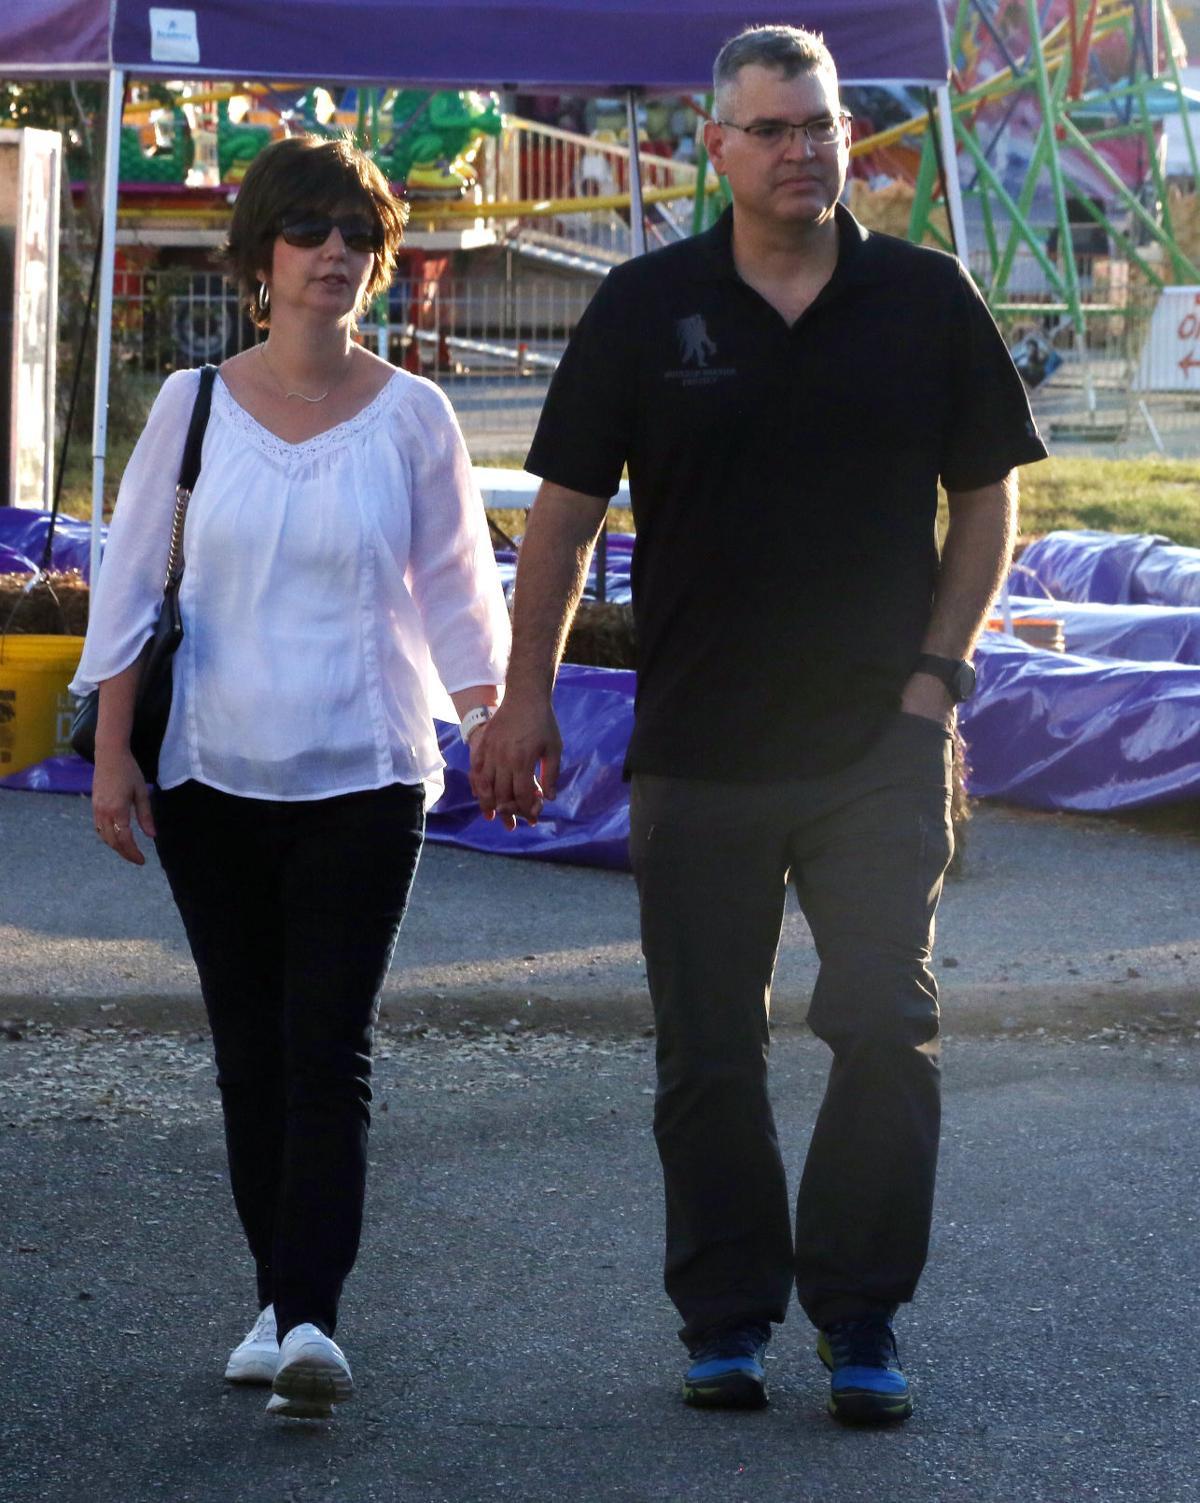 Greater Pee Dee State Fair